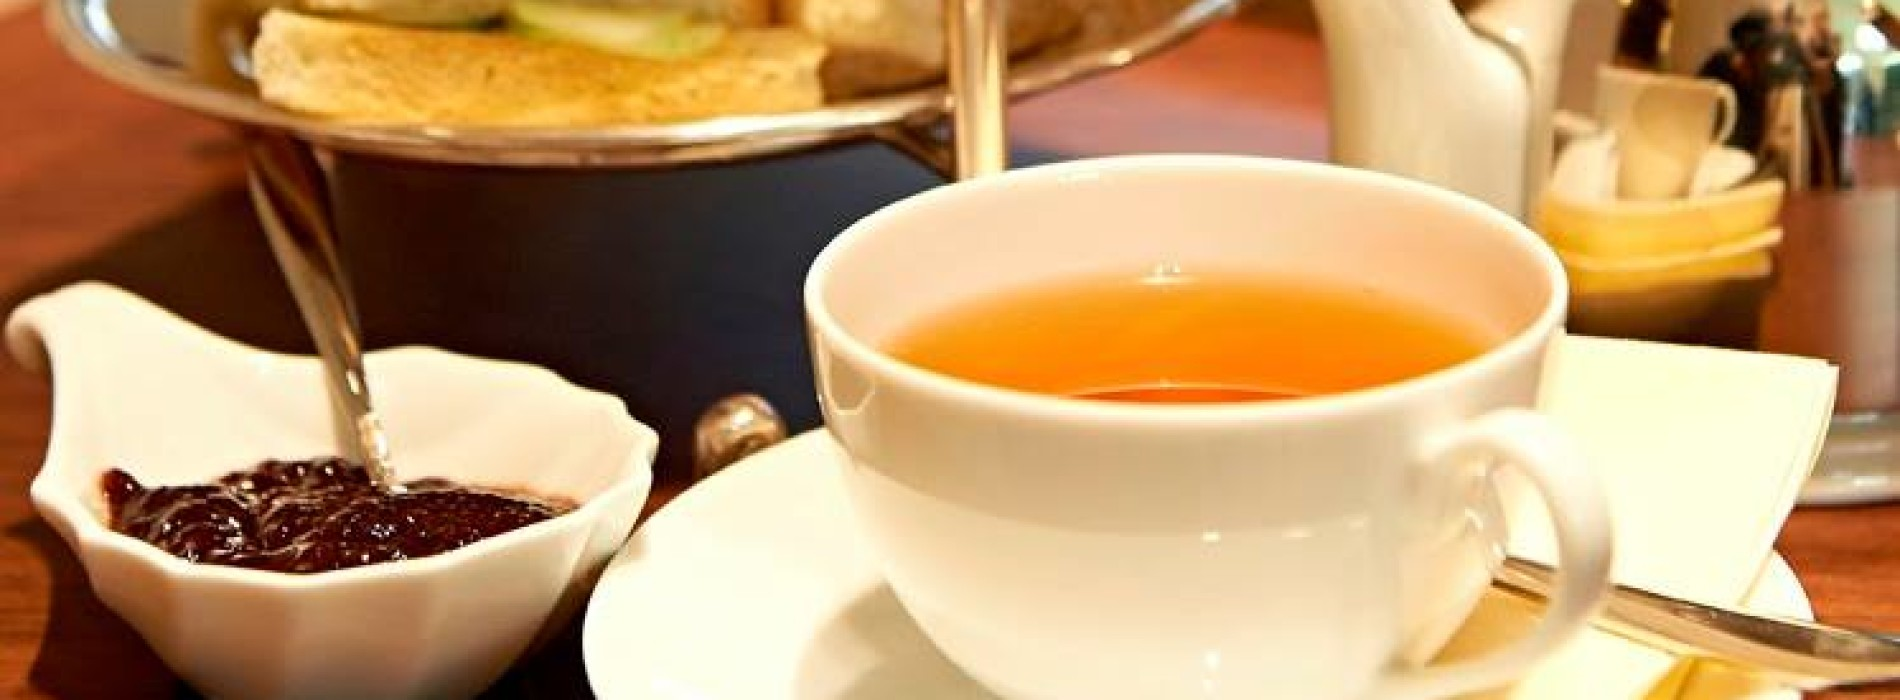 Tea room a Firenze, cinque indirizzi da provare